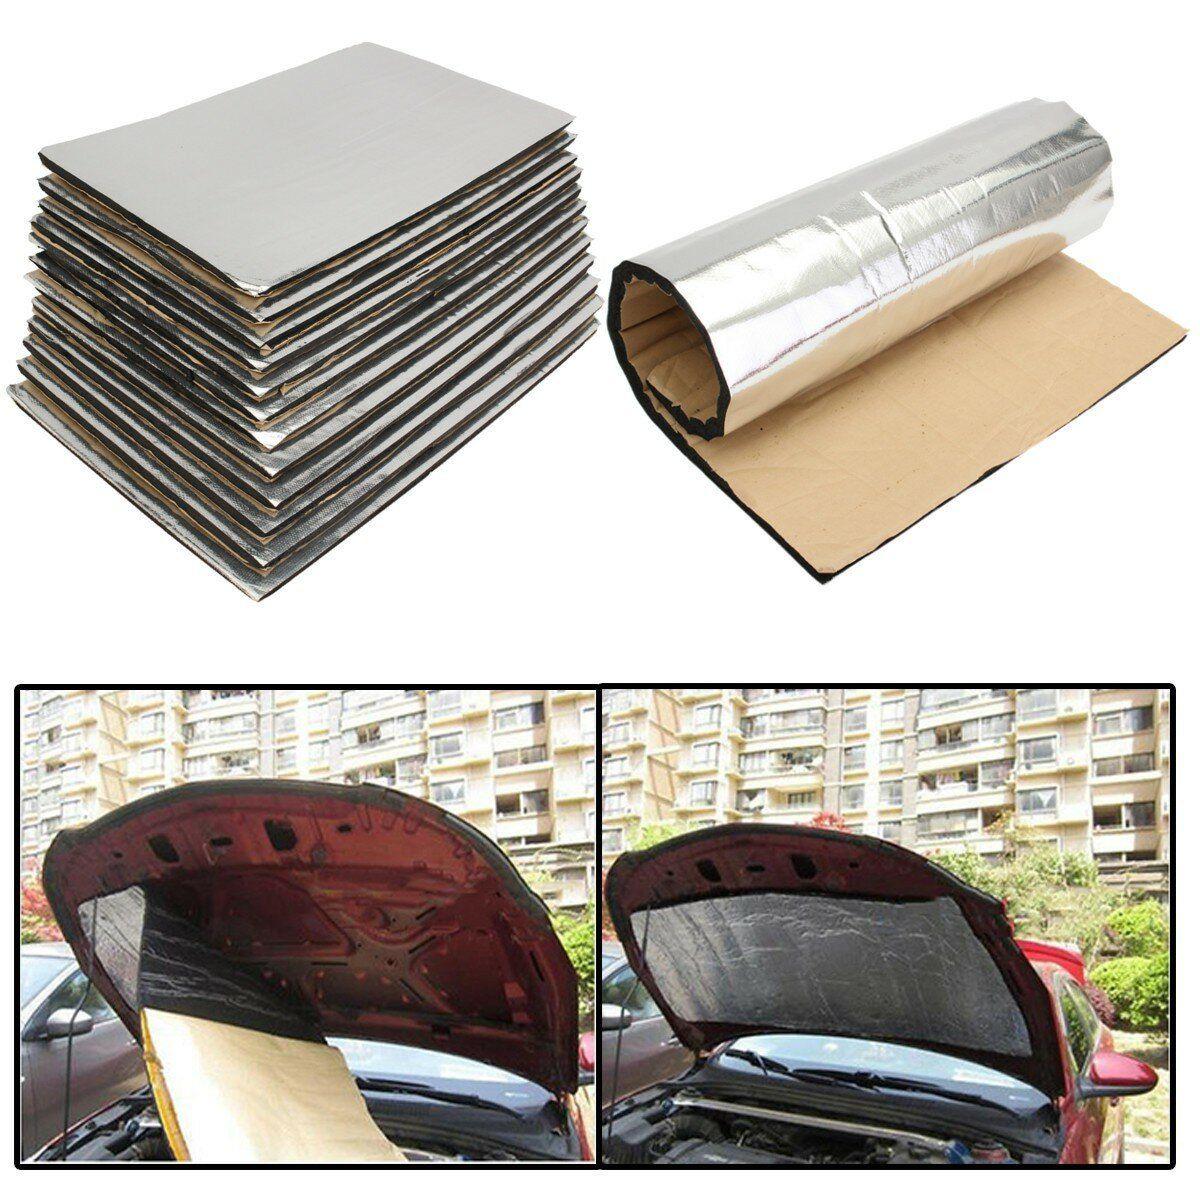 CTT US$27.03 12 Sheets 10mm Car Van Sound Proofing Deadening Insulation Closed Cell Foam